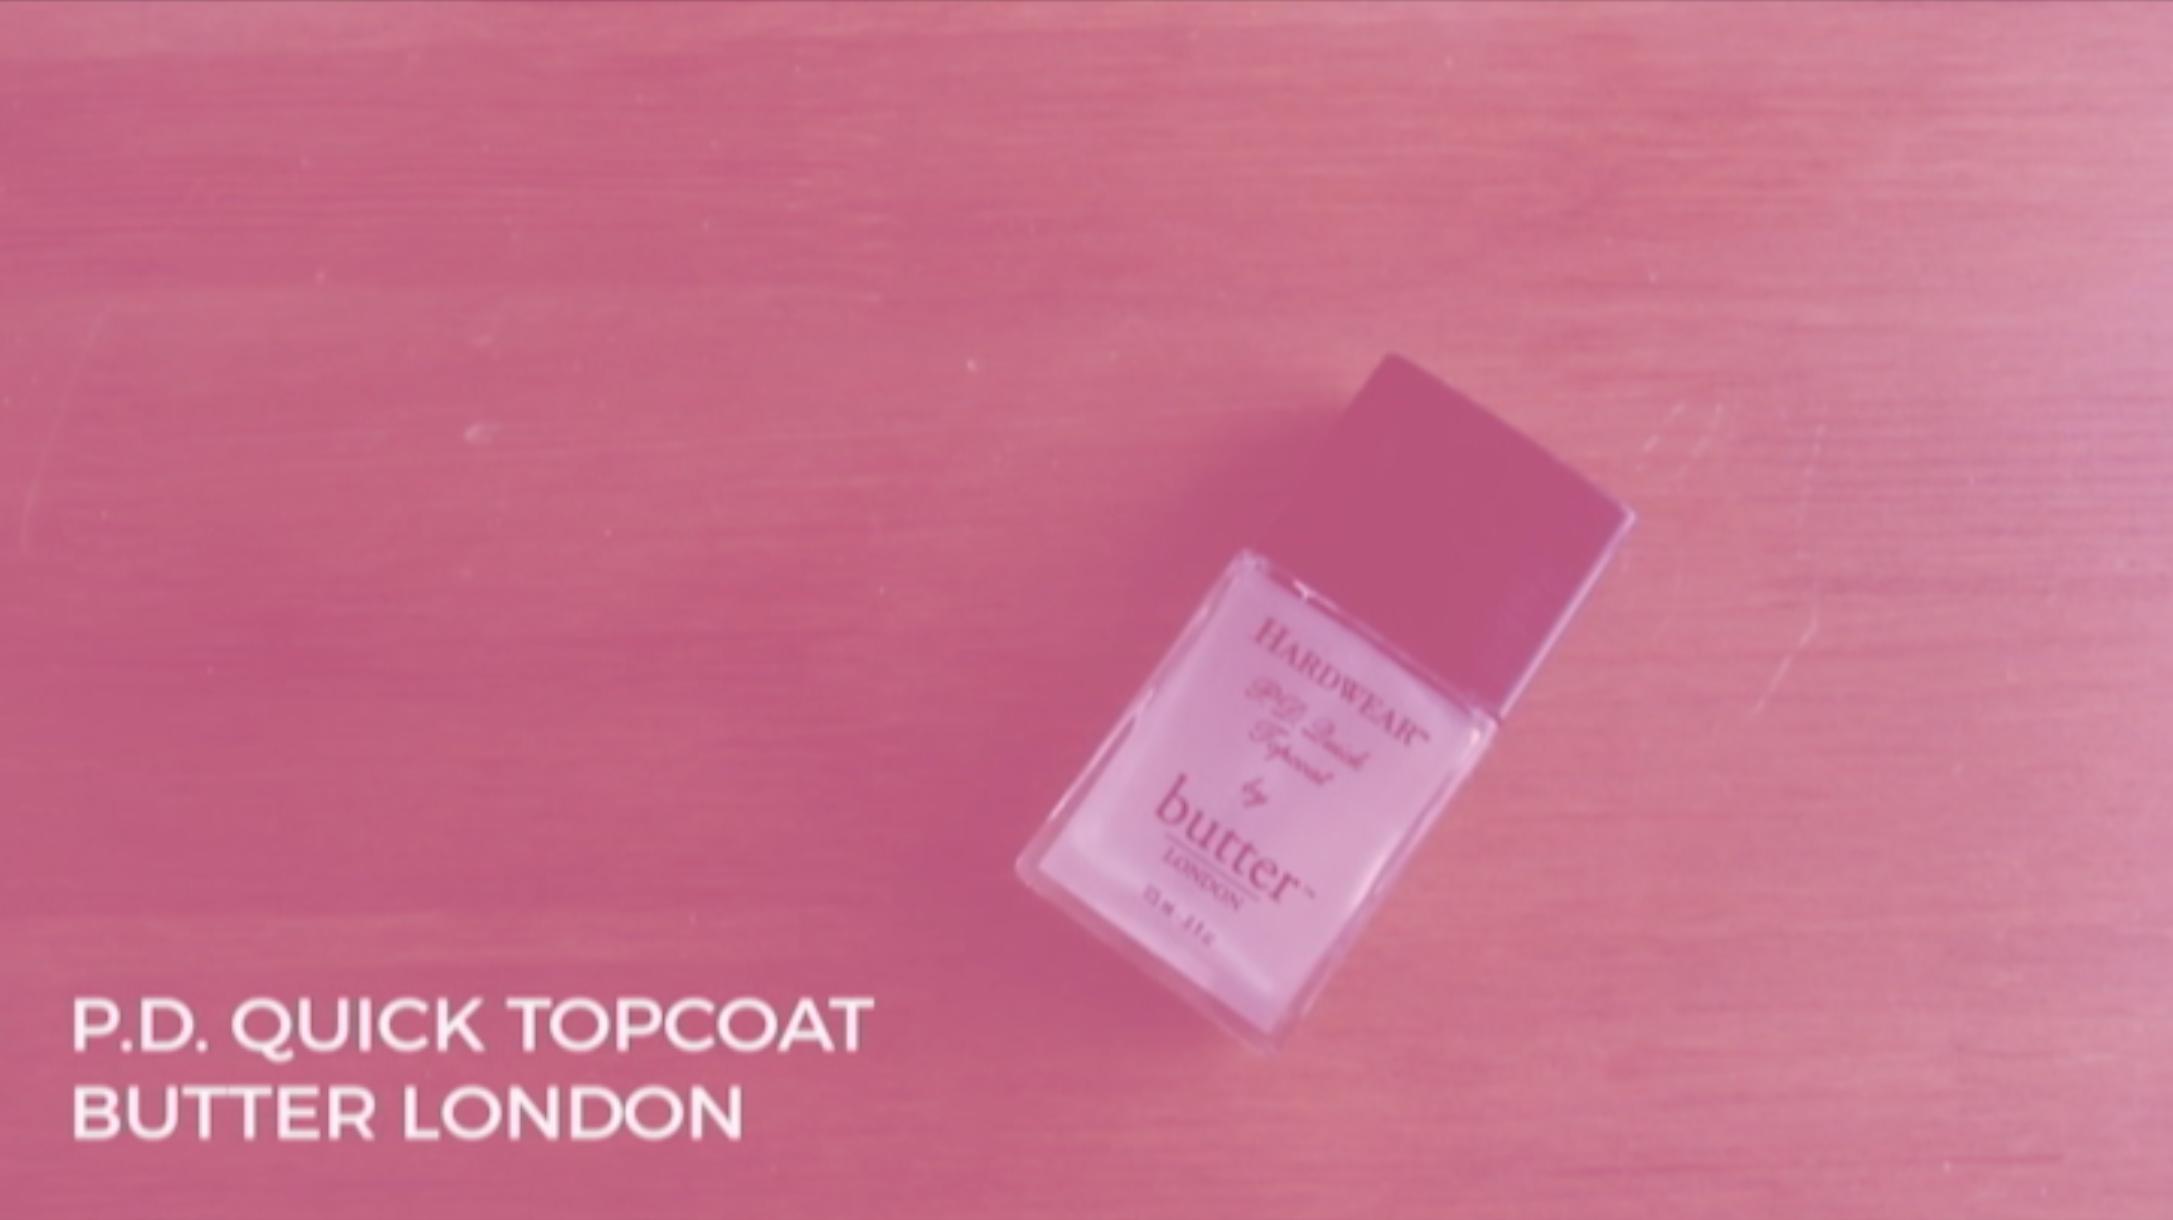 Butter London Topcoat